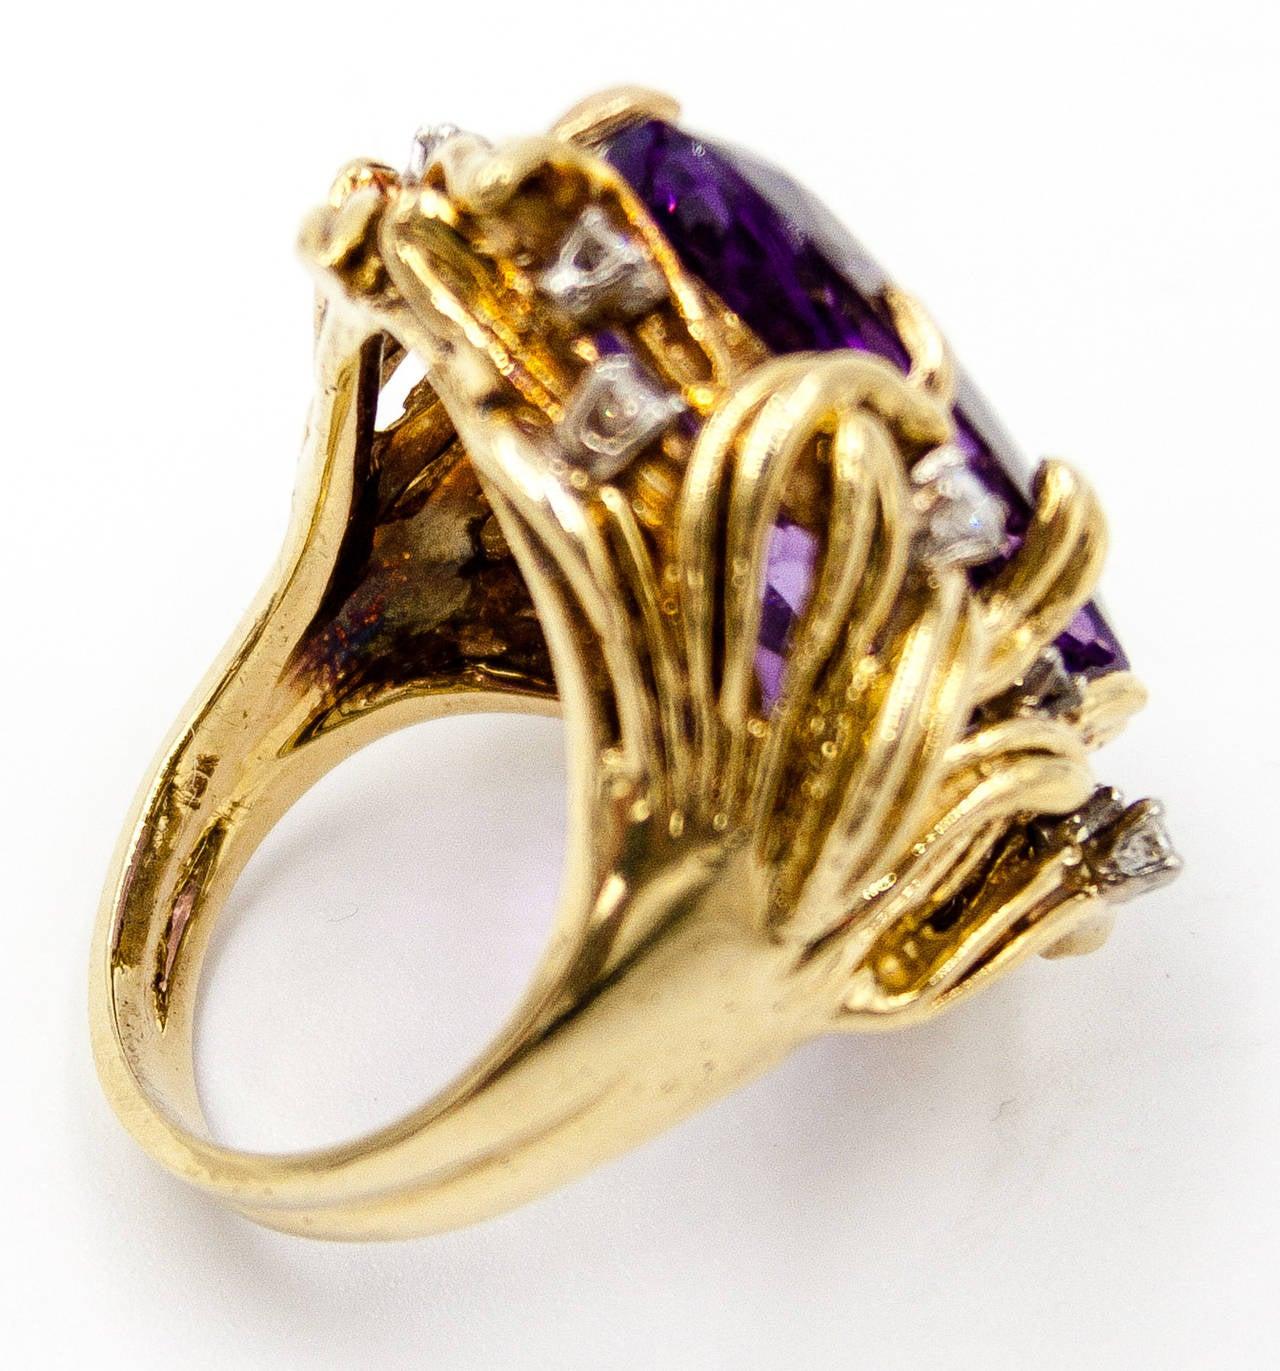 Sparkling 15 Carat Amethyst Diamond Gold Cocktail Ring 2